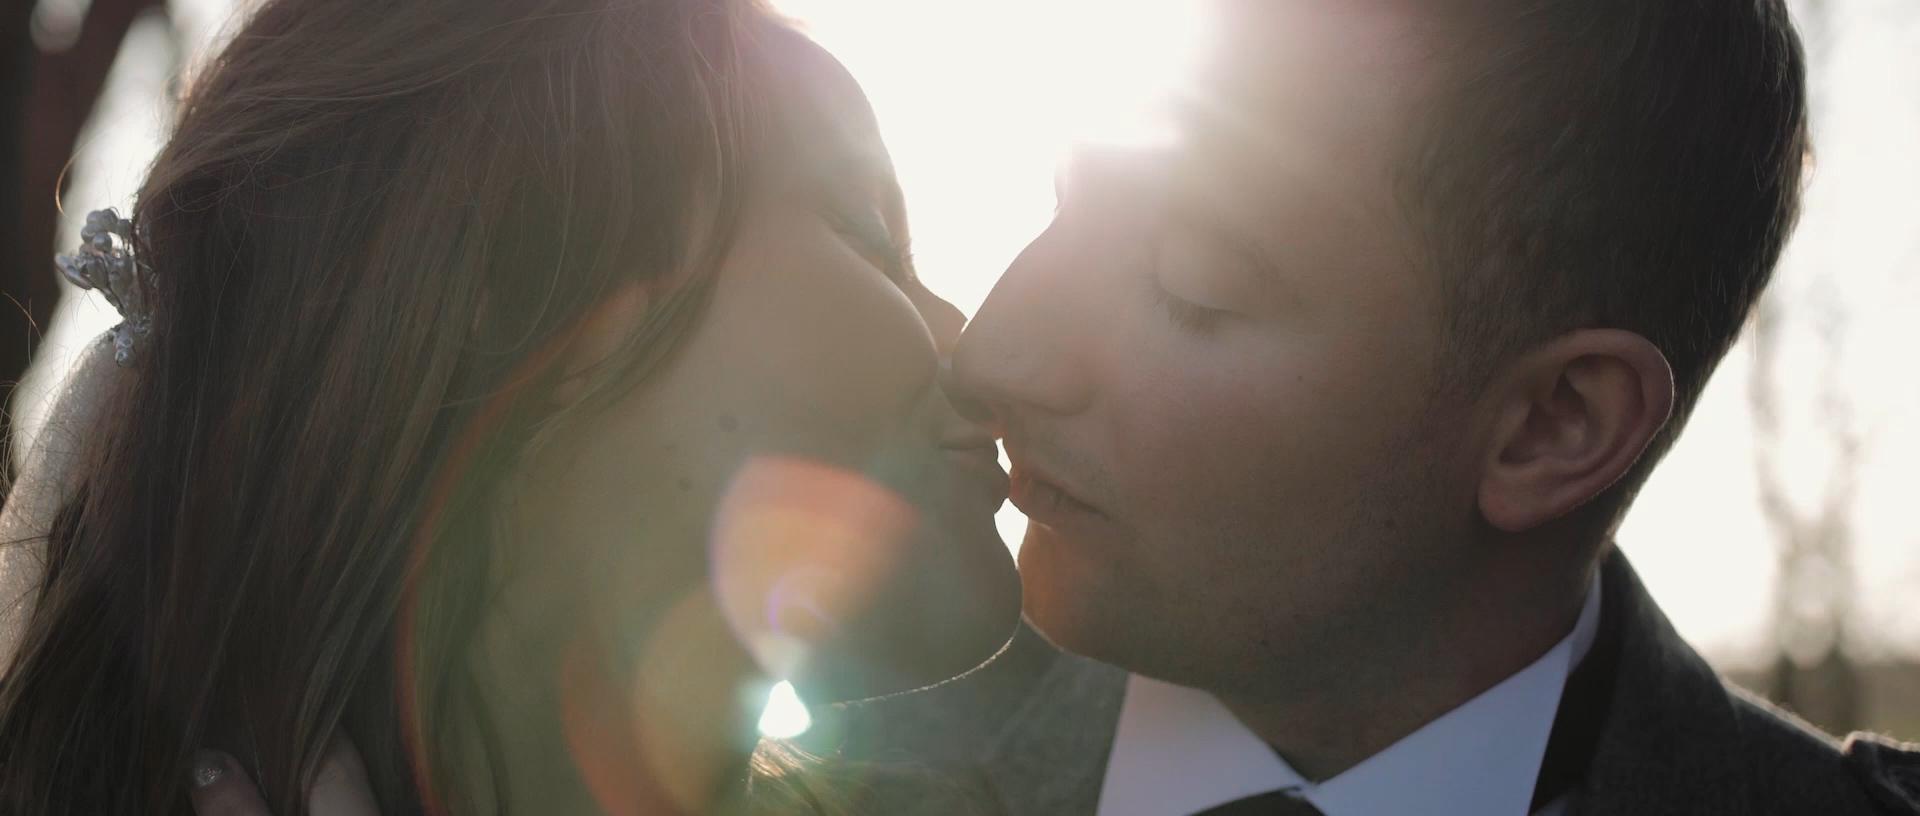 kippilaw-house-wedding-videographer_LL_03.jpg